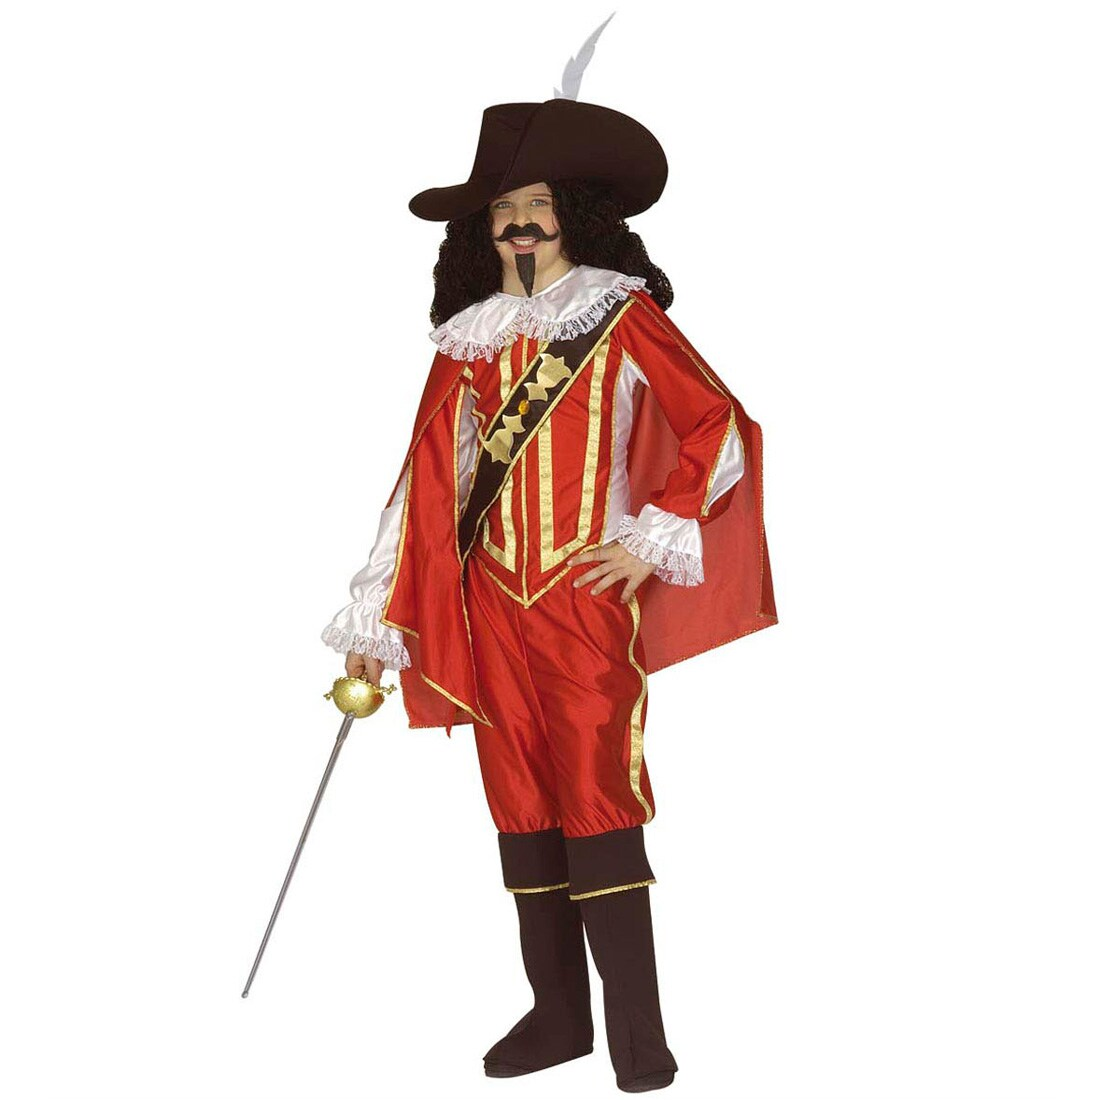 mittelalter musketier degen waffe fuchtel kost m zubeh r. Black Bedroom Furniture Sets. Home Design Ideas